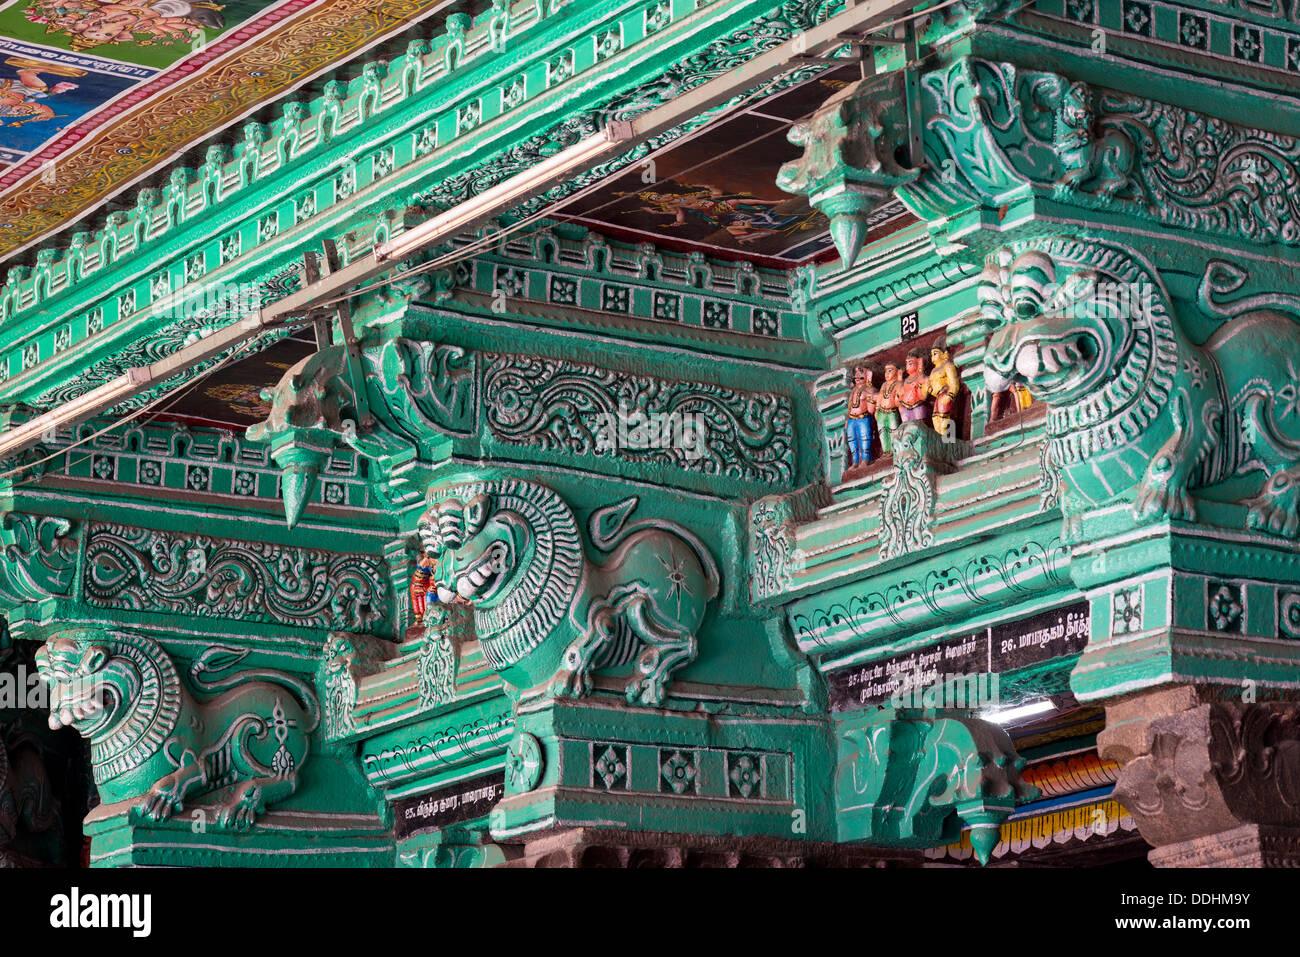 Green painted pillars, mythical creatures, Meenakshi Amman Temple or Sri Meenakshi Sundareswarar Temple - Stock Image